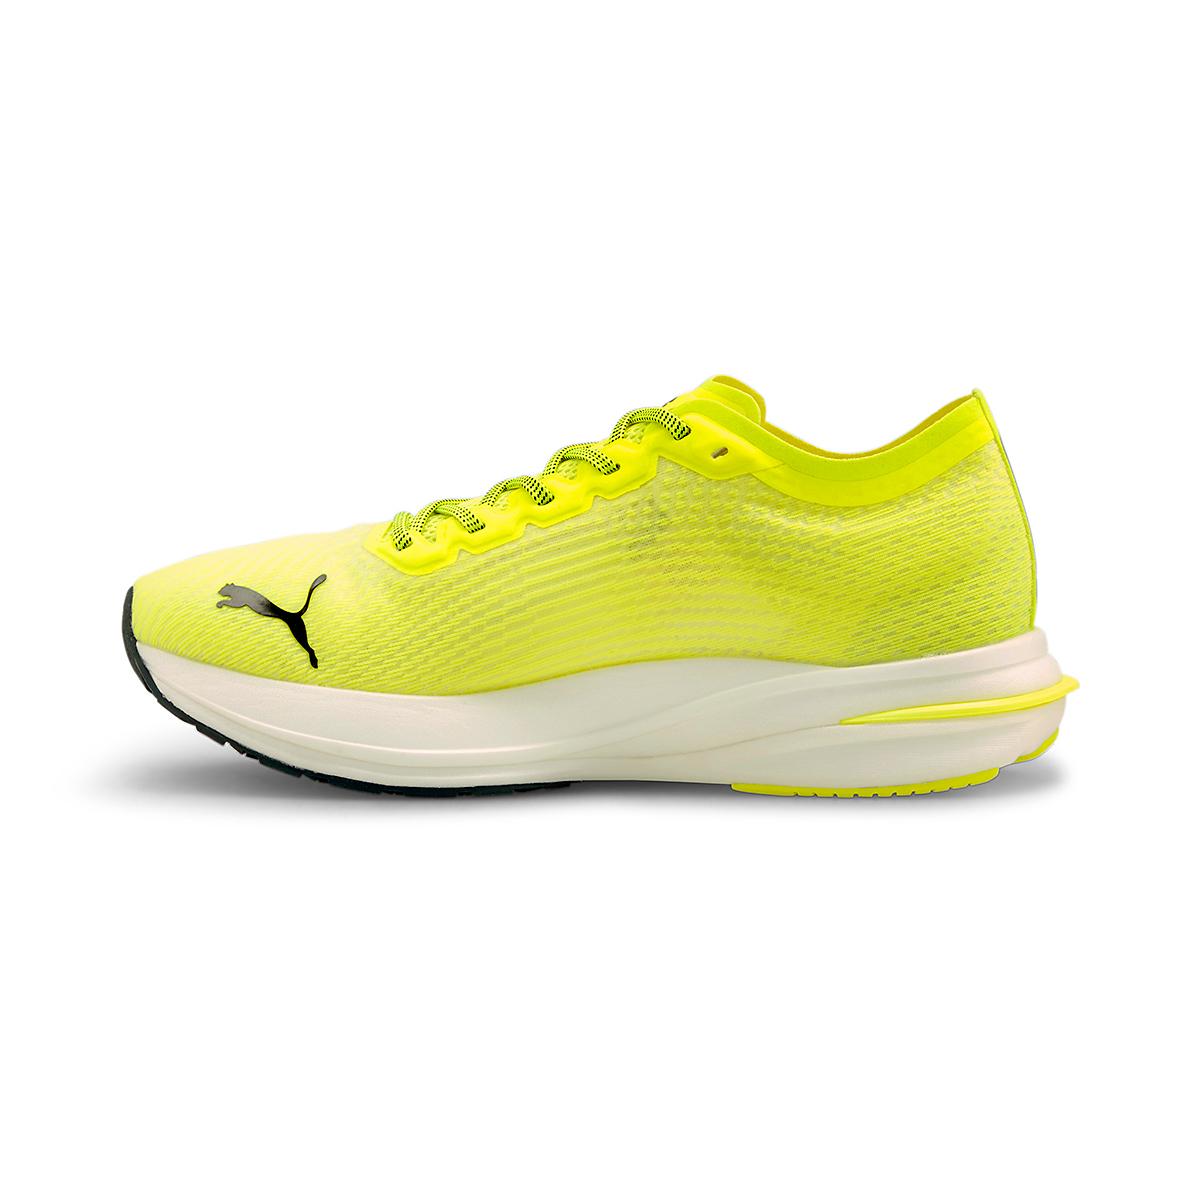 Men's Puma Deviate Nitro Running Shoe - Color: Yellow Alert - Size: 7 - Width: Regular, Yellow Alert, large, image 2